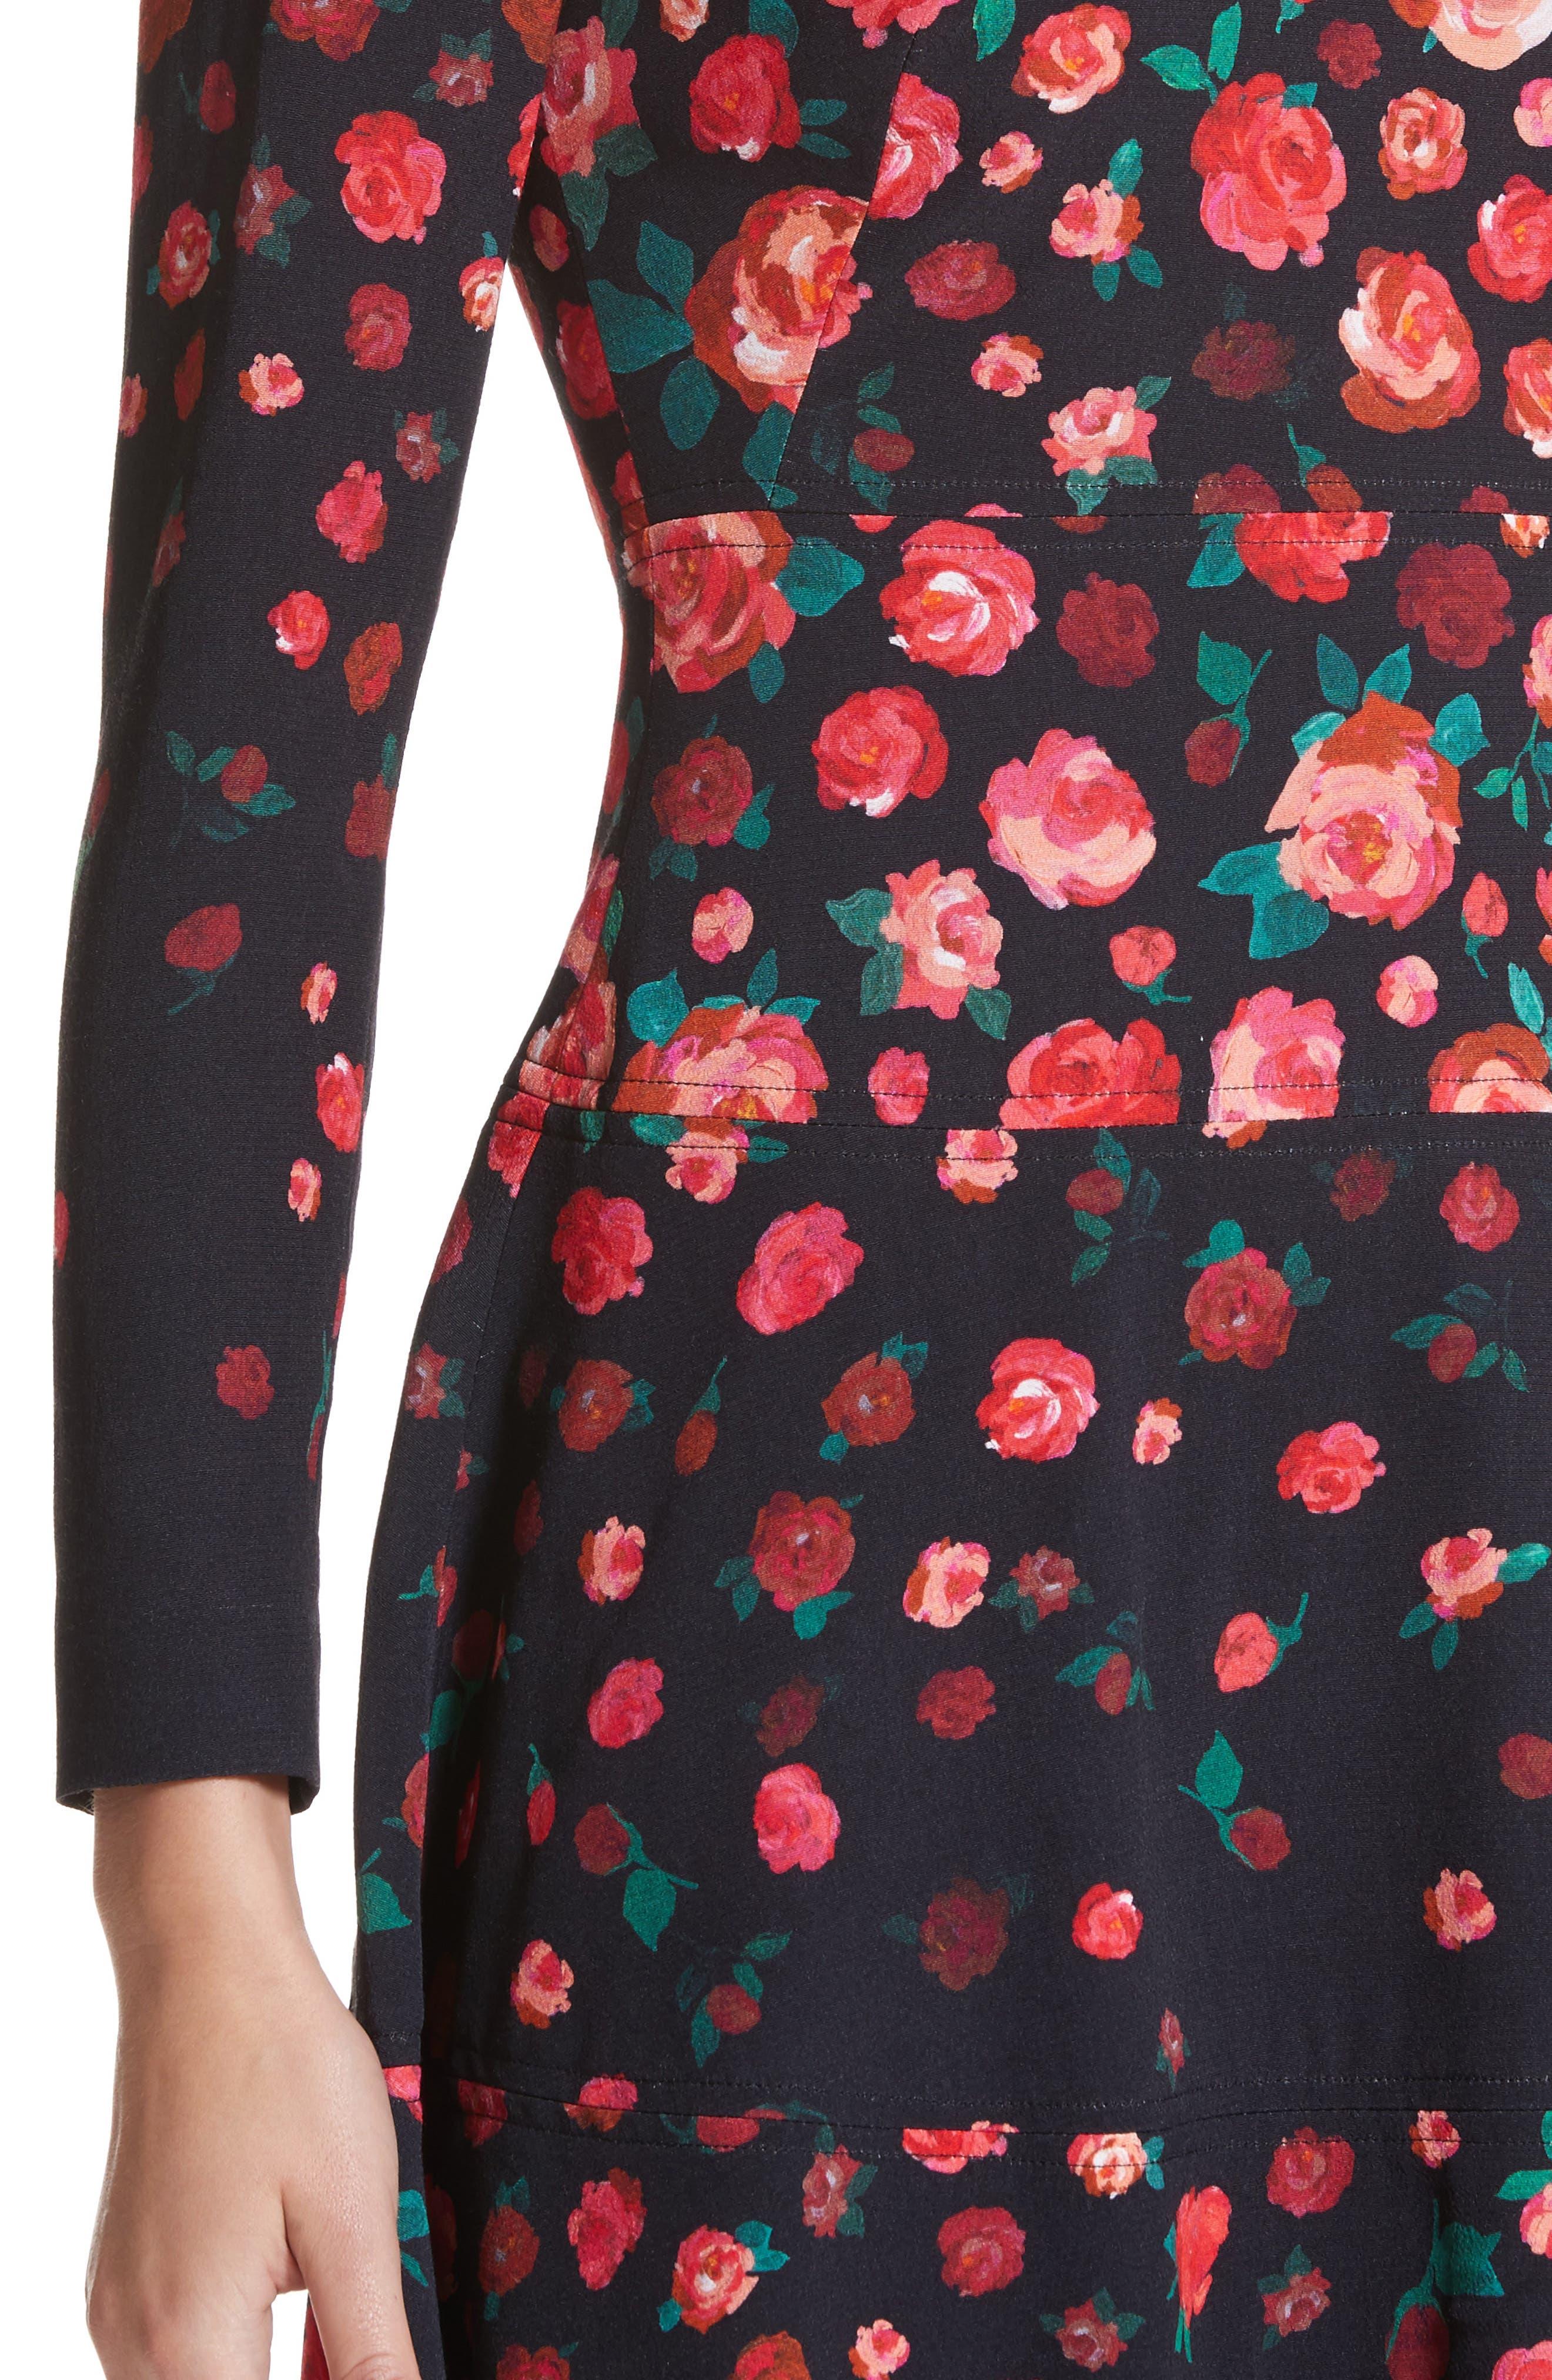 Floral Print Fit & Flare Dress,                             Alternate thumbnail 4, color,                             621